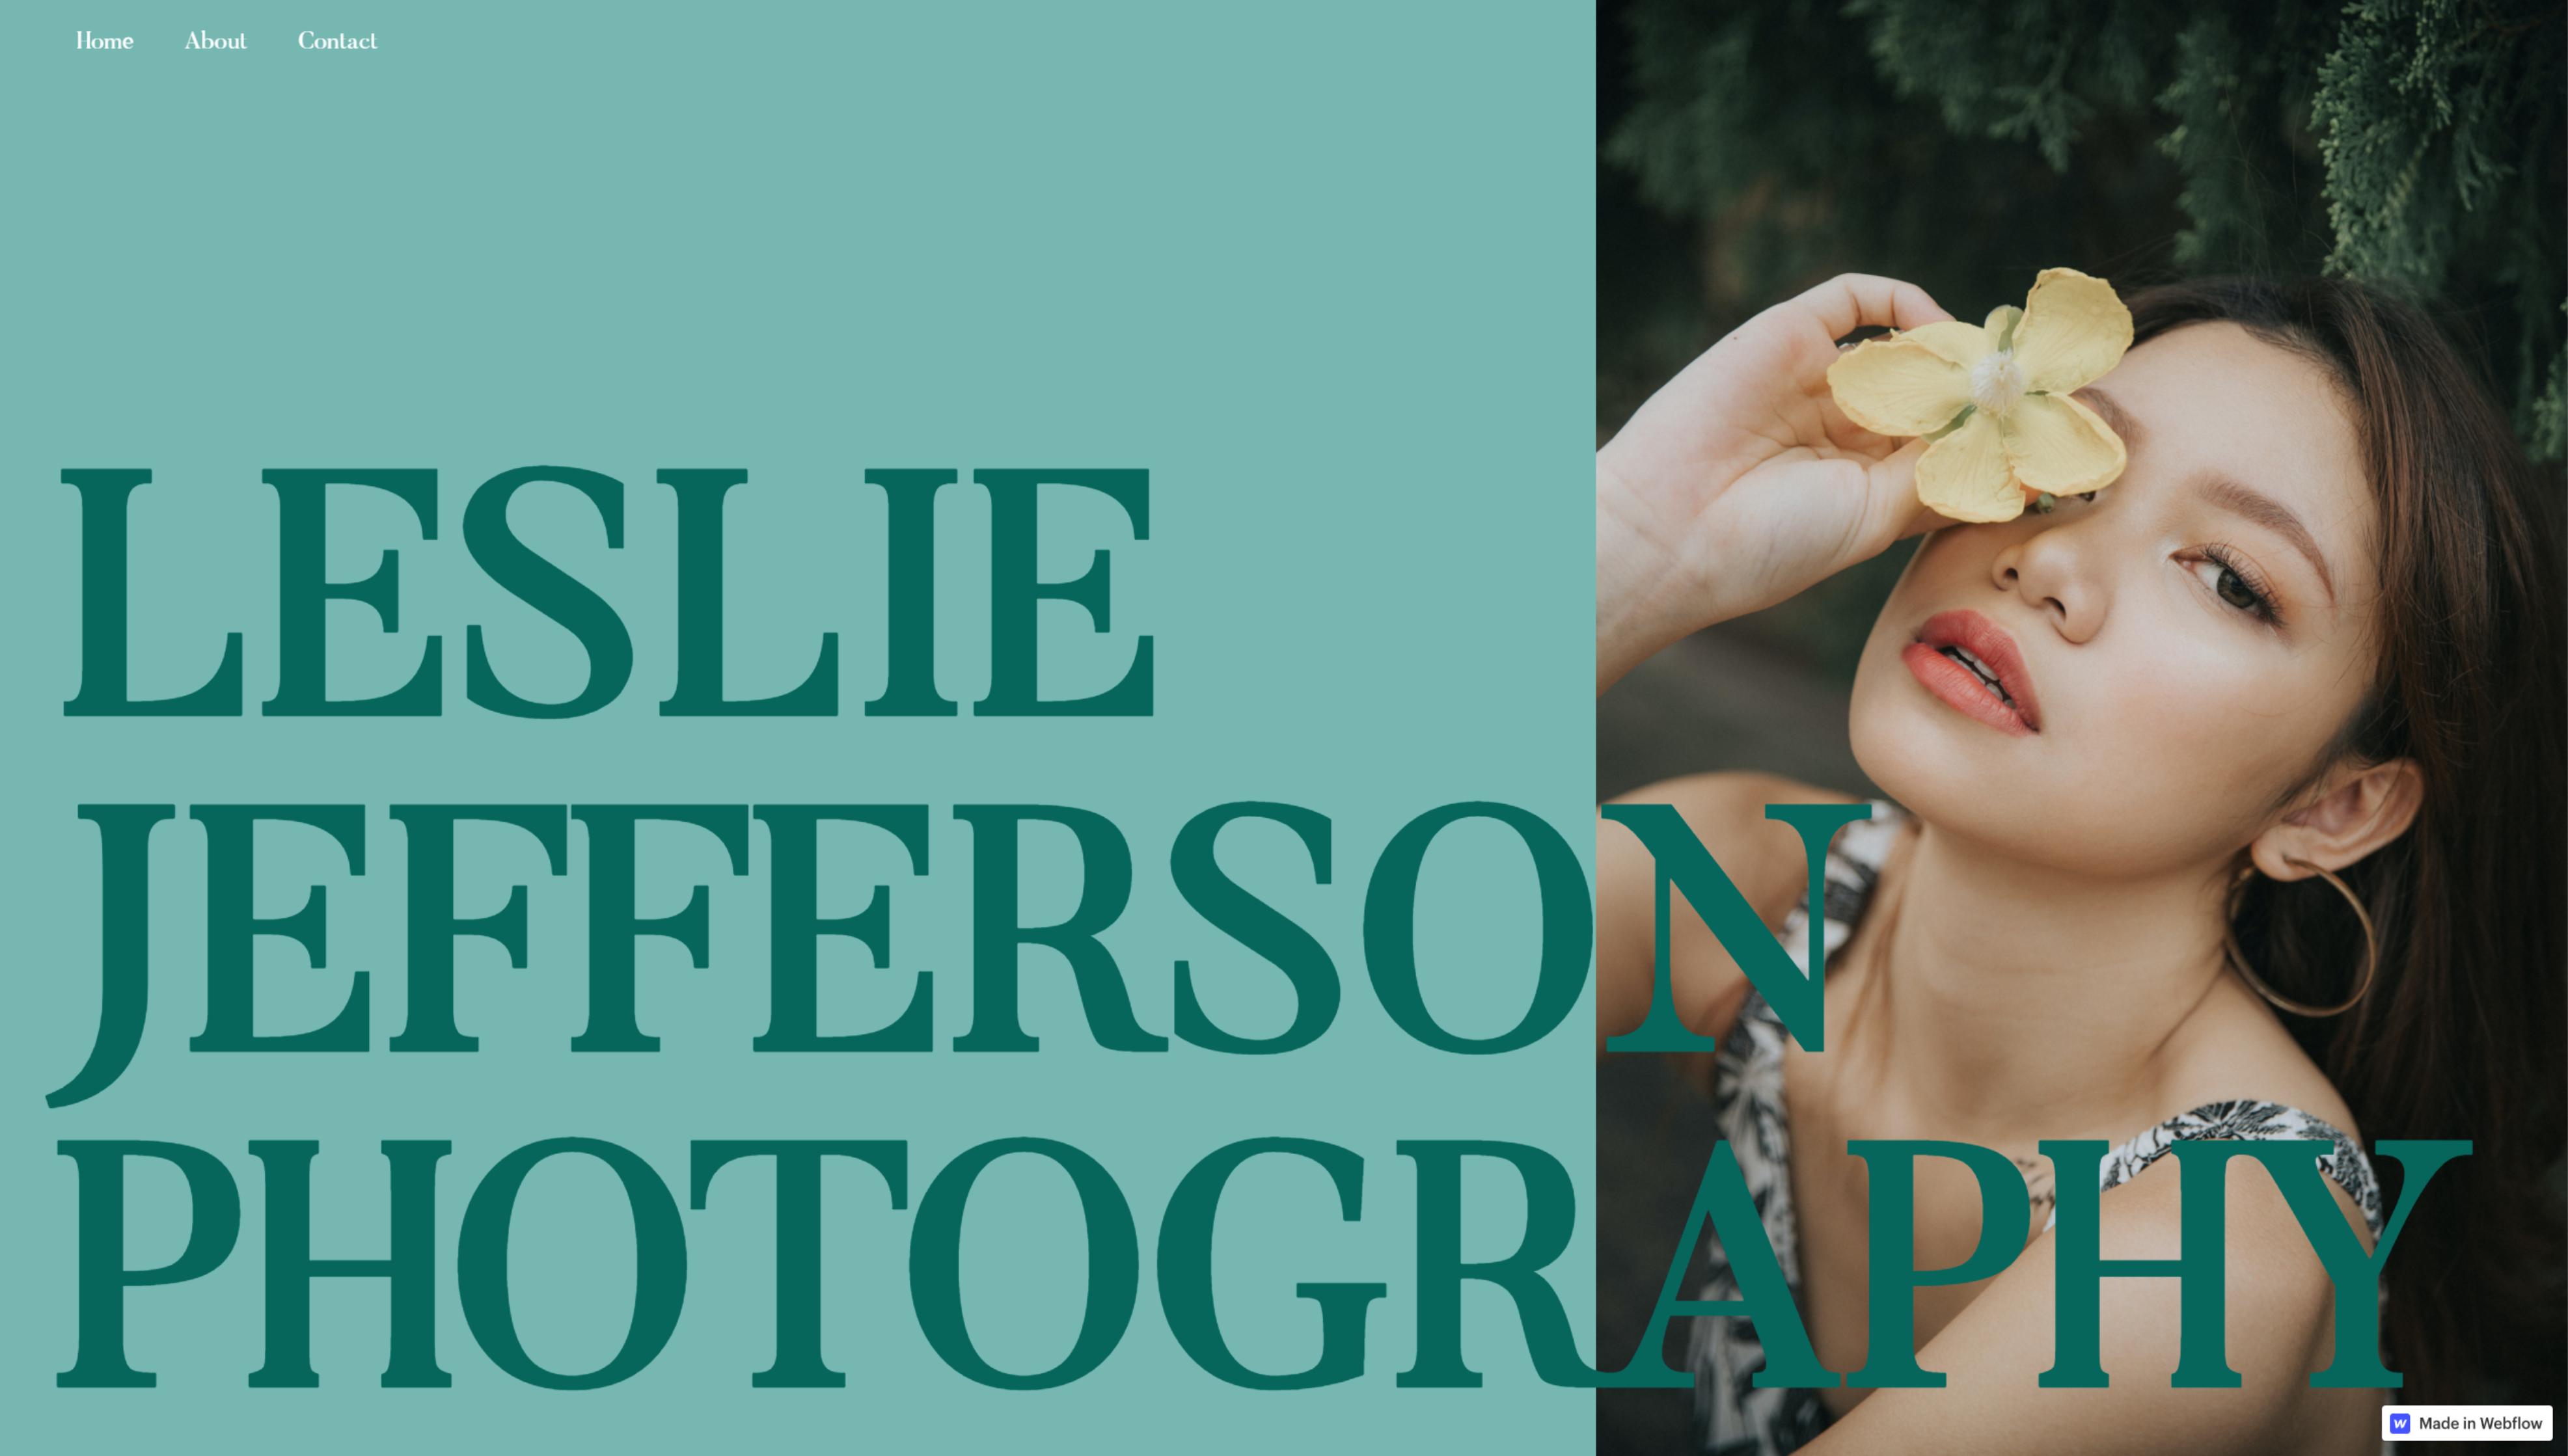 Leslie Jefferson